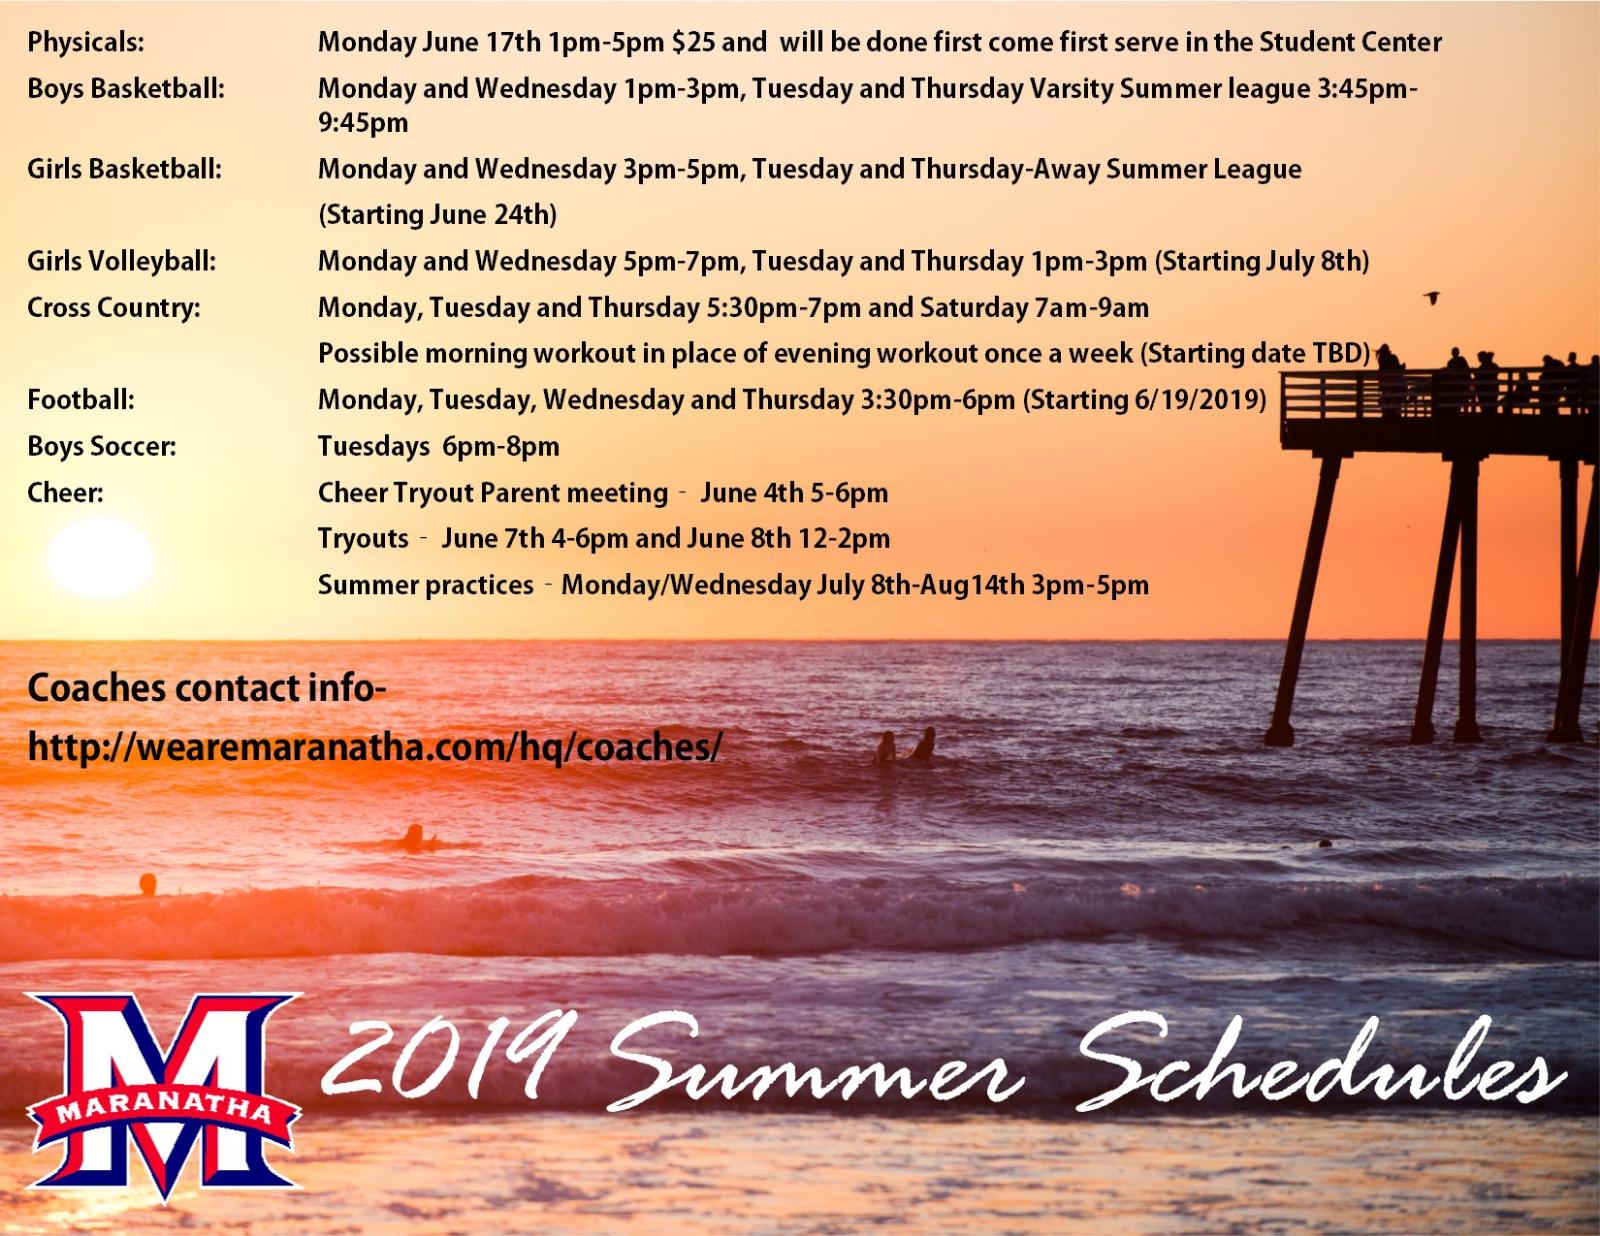 *UPDATED* Summer Practice Schedules (6-22-19)